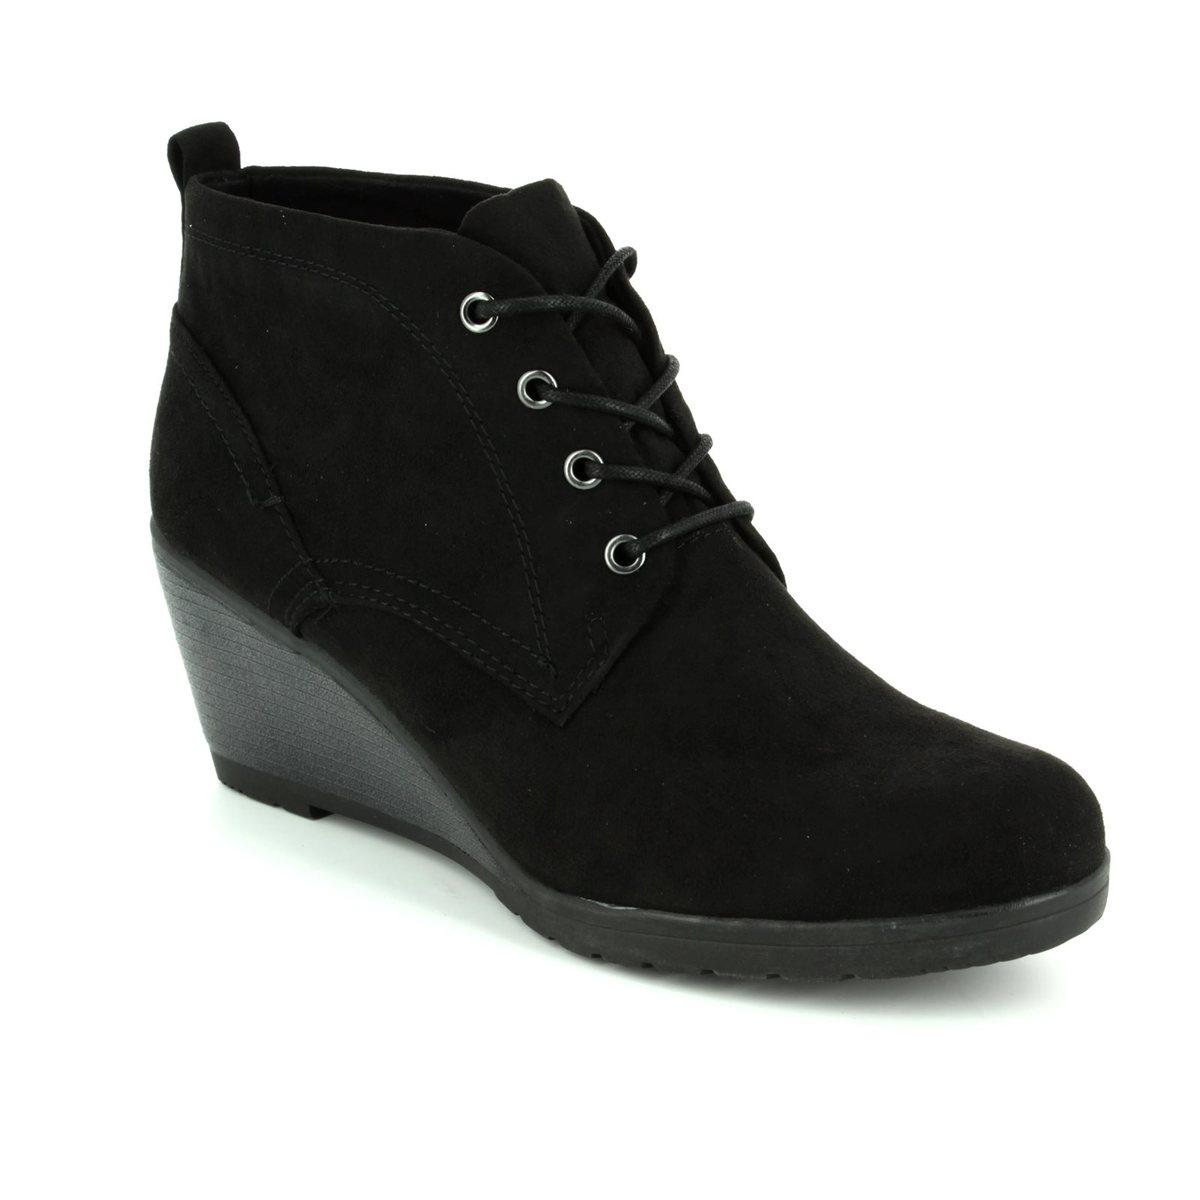 c0ed7f89a8 Marco Tozzi Ranco 62 25111-001 Black ankle boots